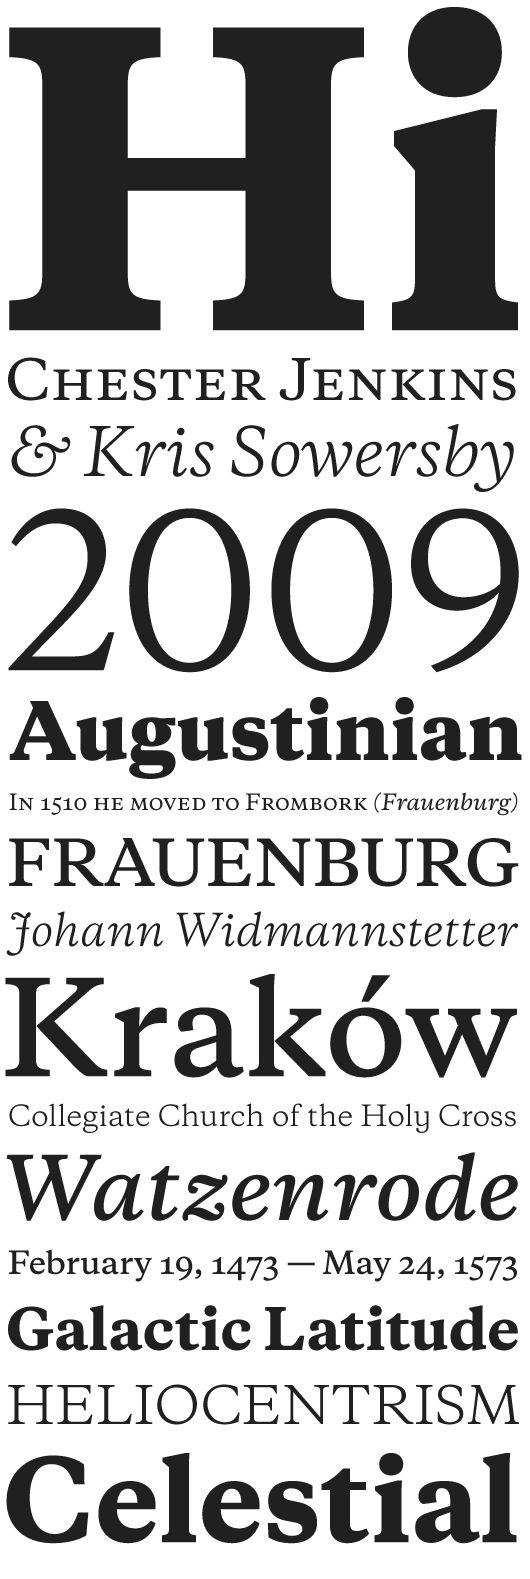 Copernicus Book Font - What Font Is